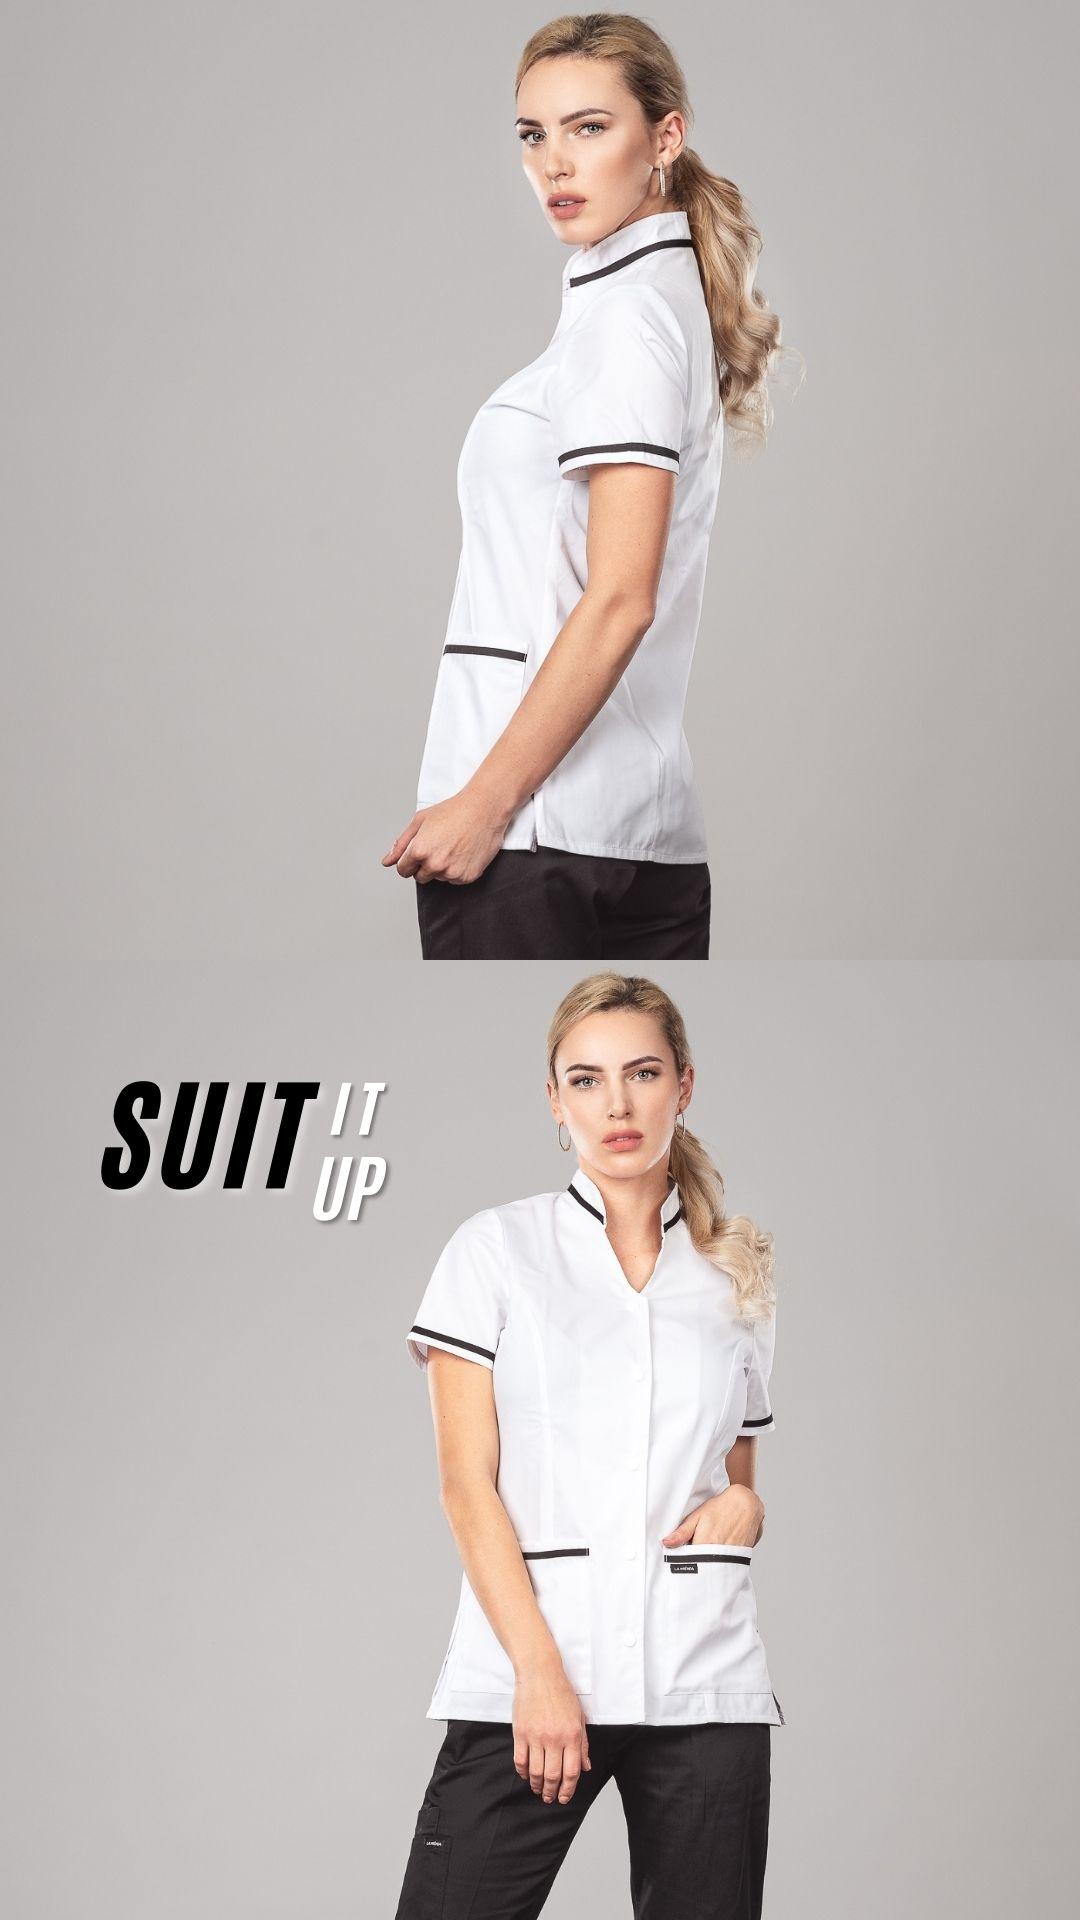 Pyjama medical _Col Officier _ Blanc/Black Profil Gauche/Face 3